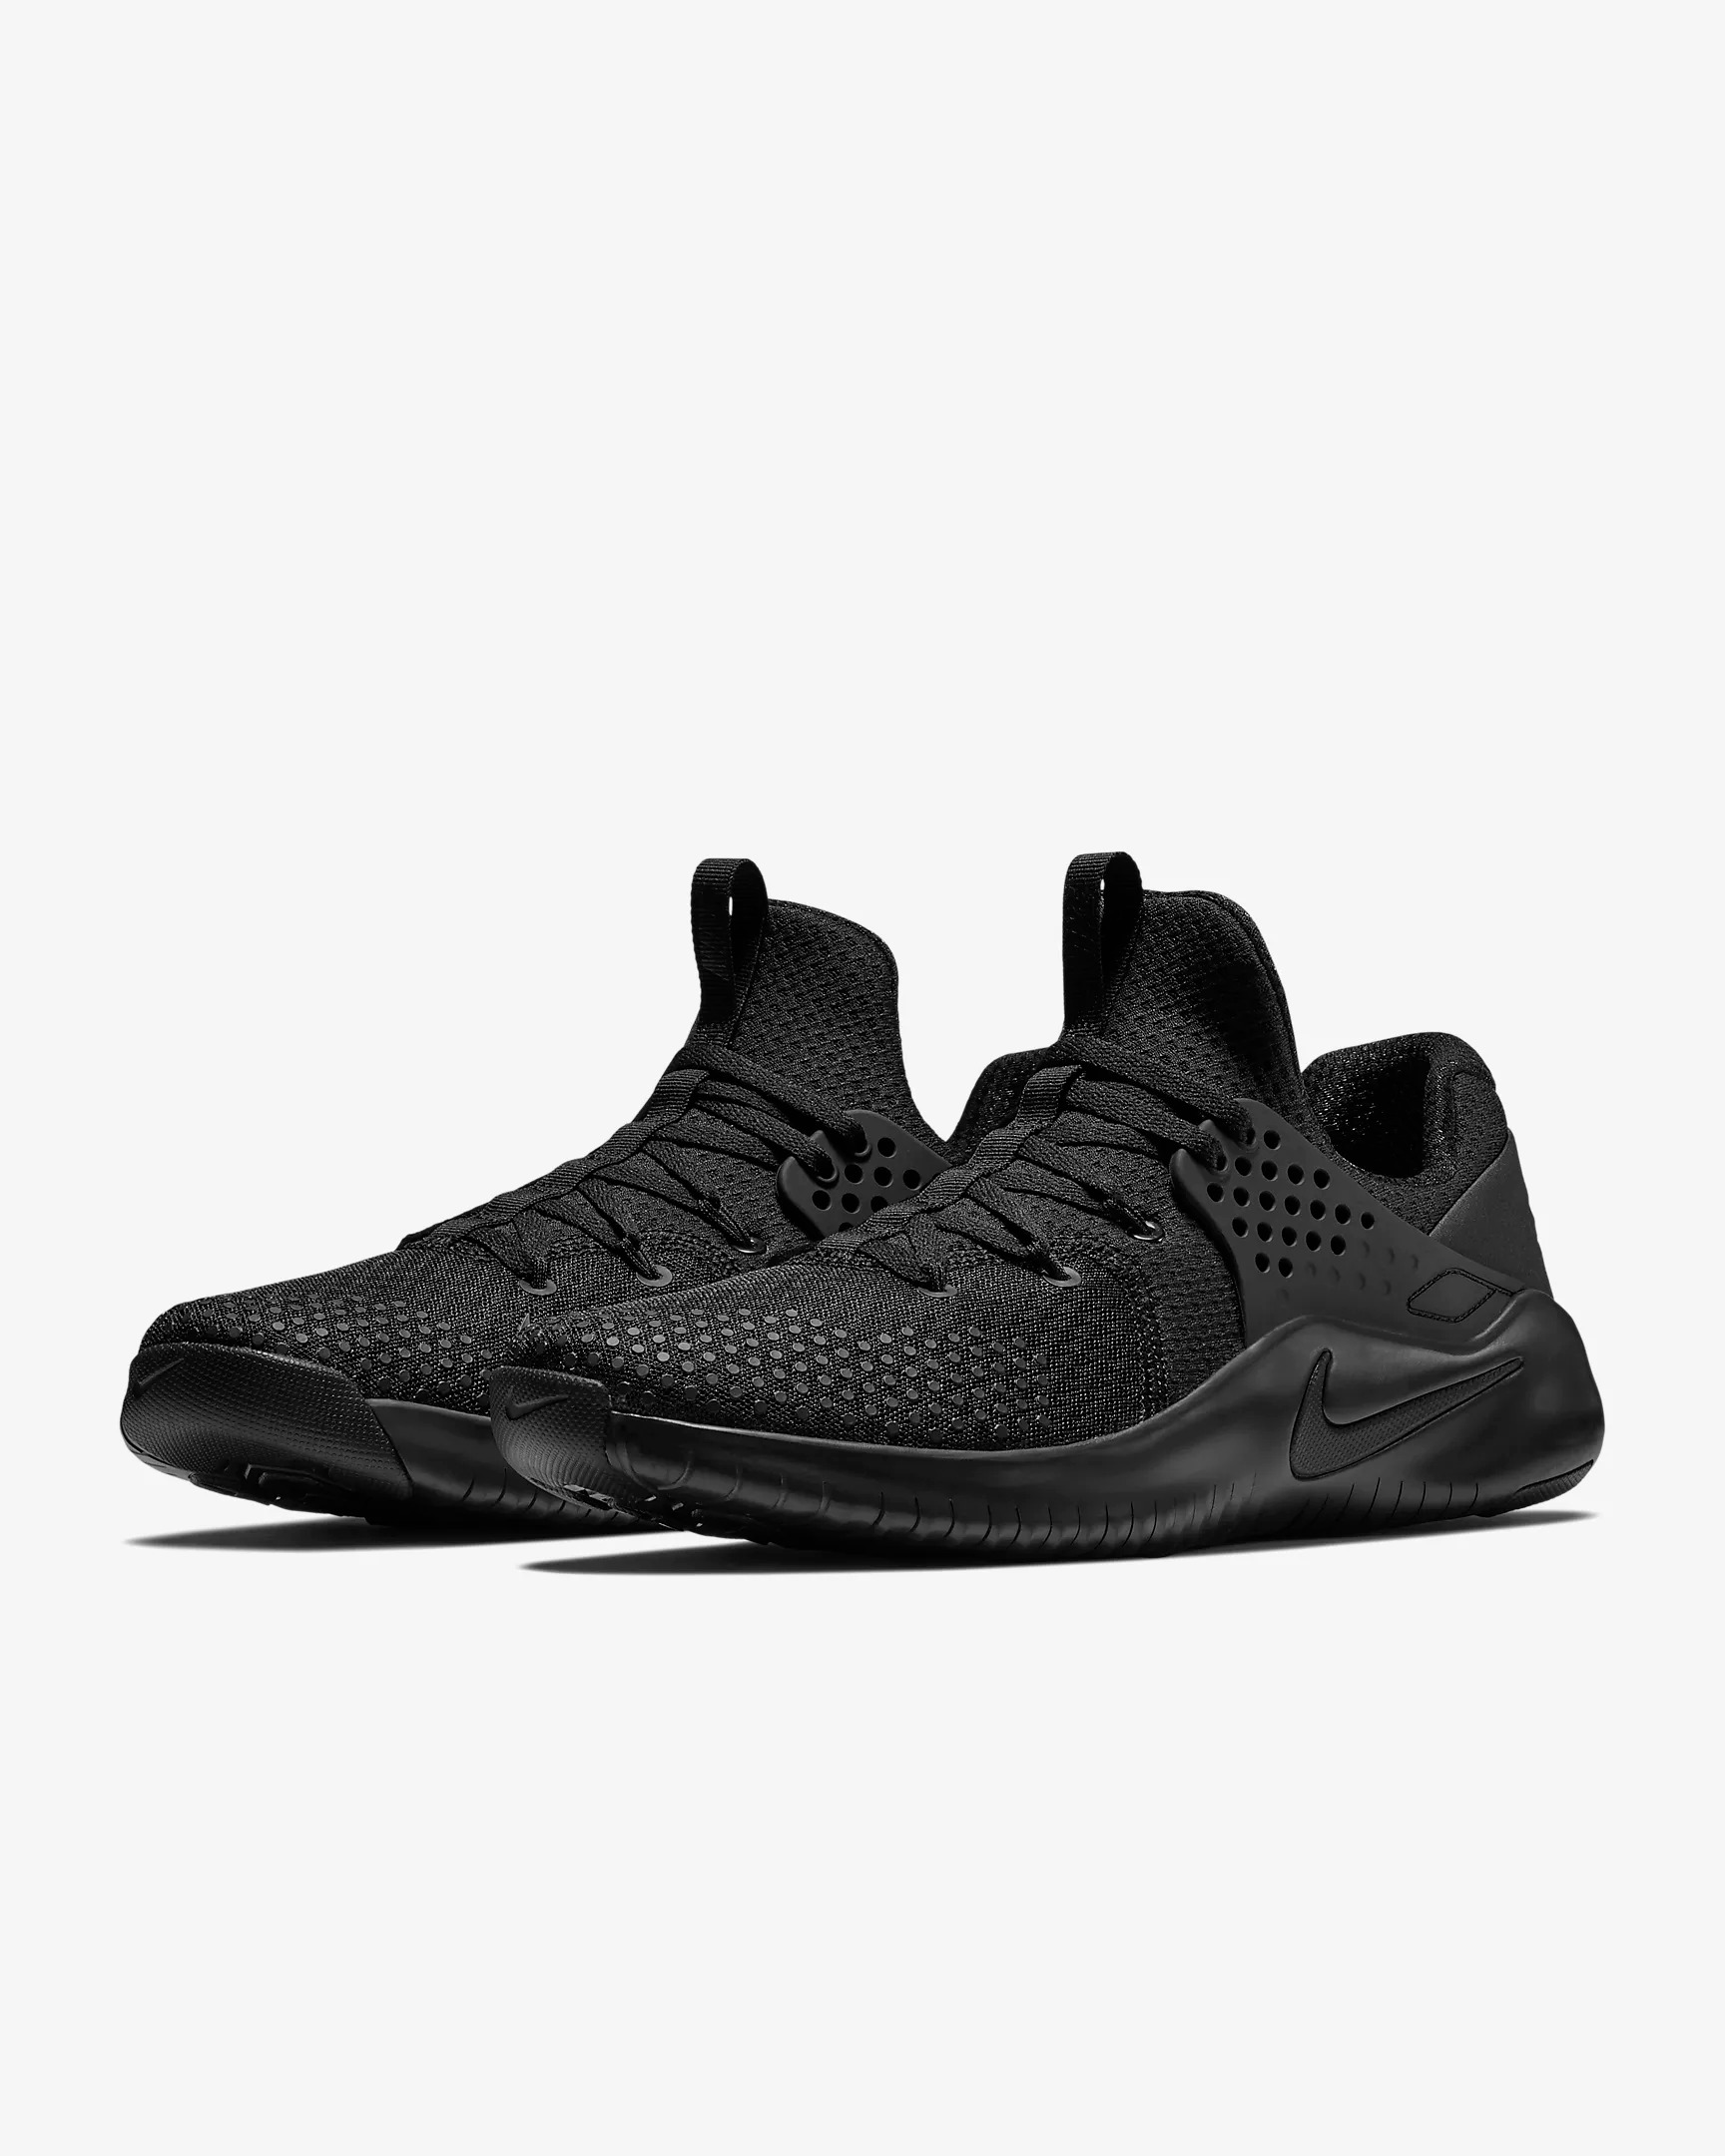 7d2645e82b20 Nike Free Trainer V8 Training Shoes - SPORT SHOES TRAINING SHOES -  Superfanas.lt